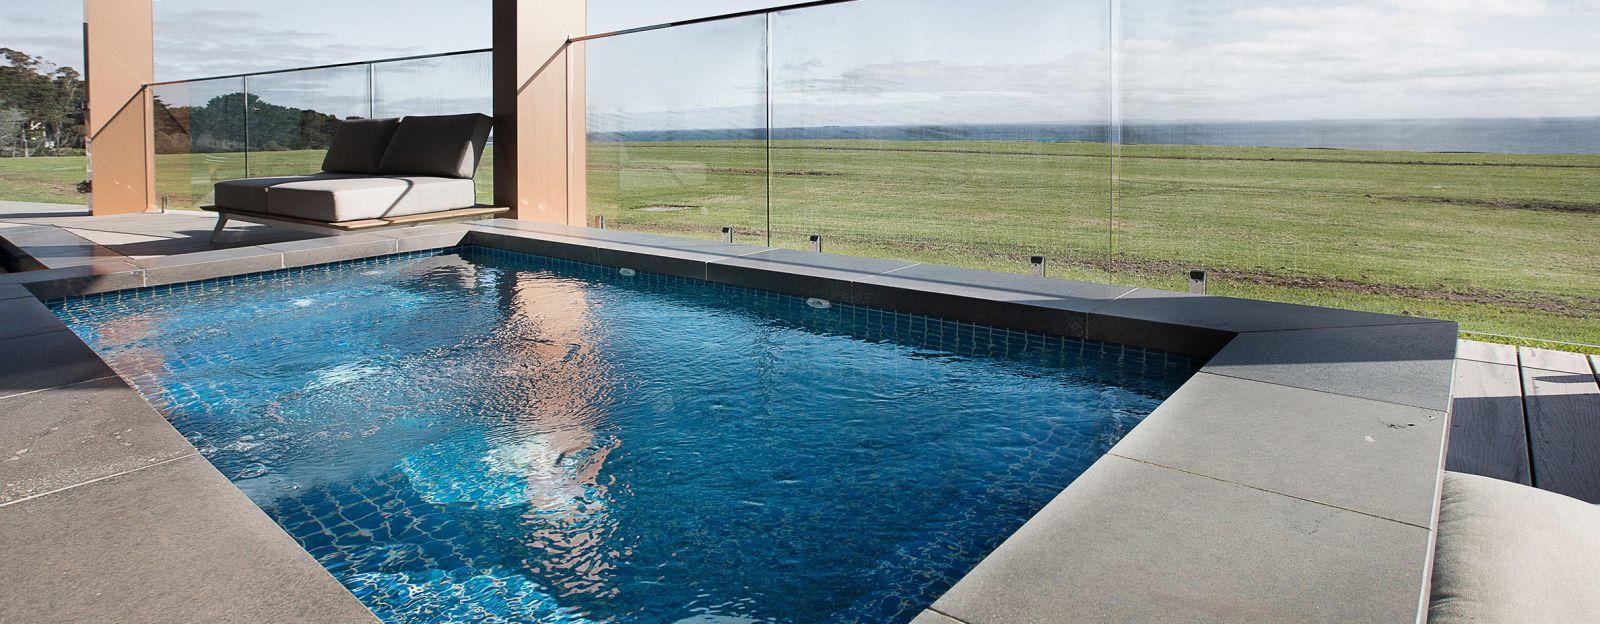 20 swimming pool builders mornington peninsula decor23 for Concrete pool builders